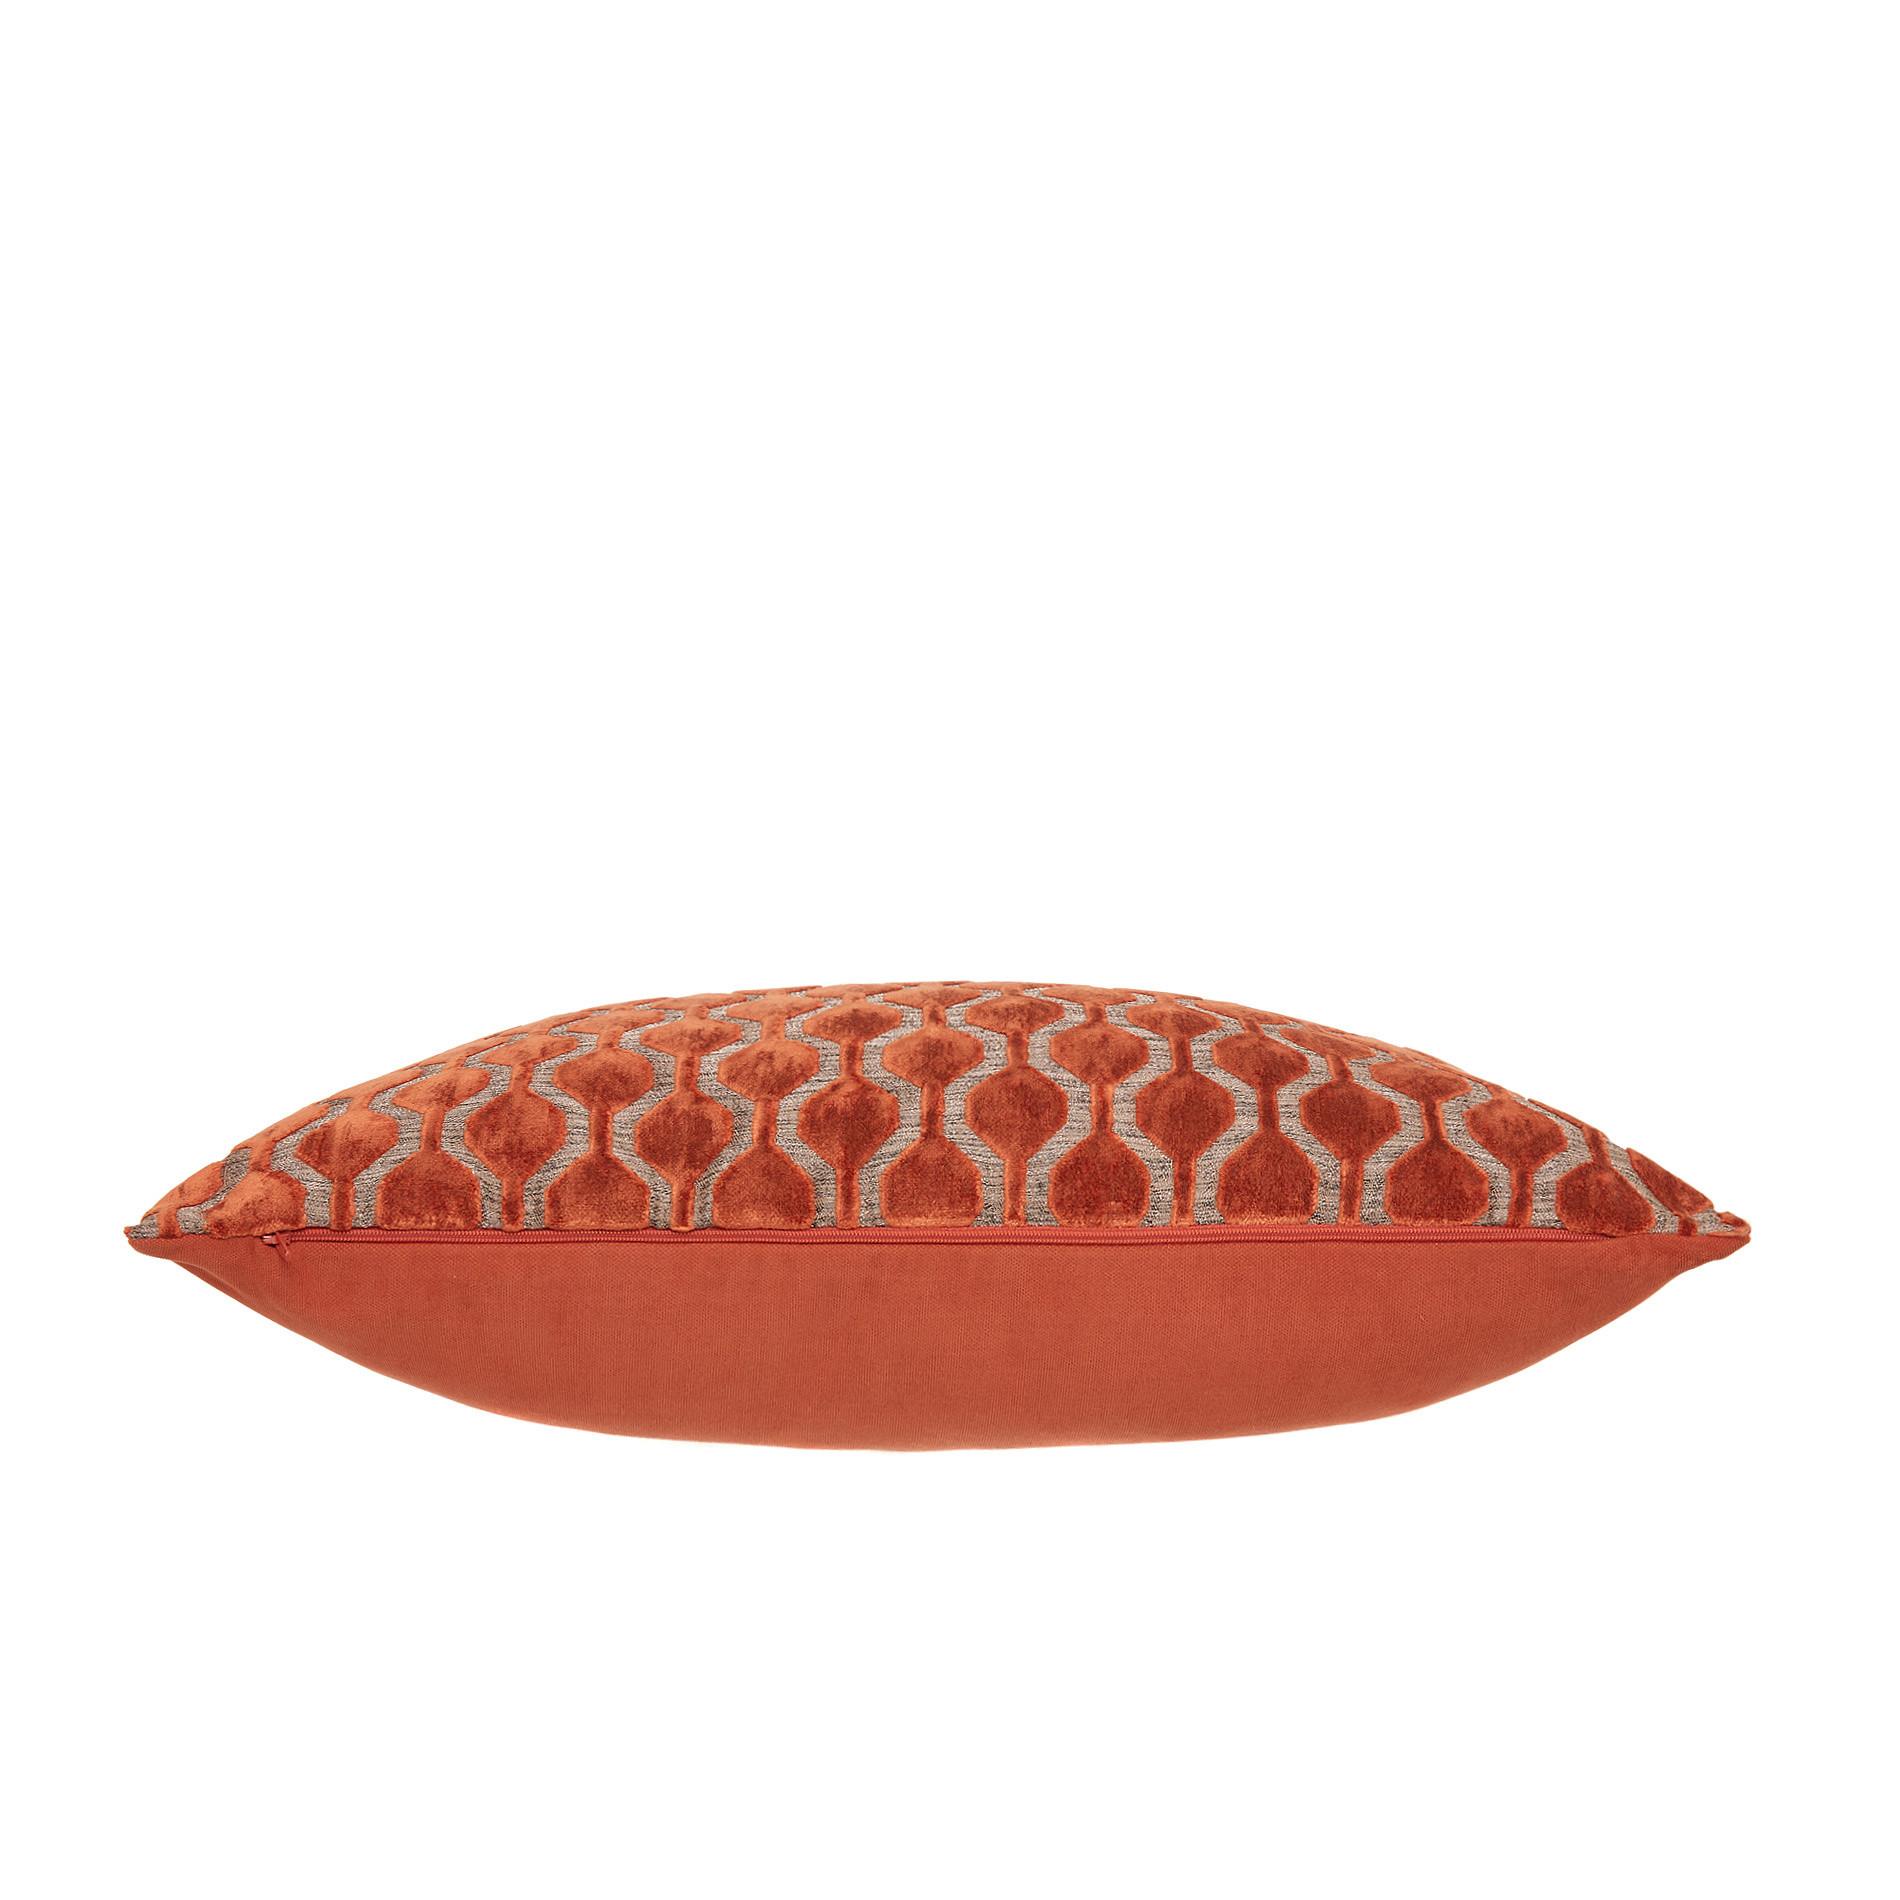 Cuscino velluto motivo geometrico 35x55cm, Marrone chiaro, large image number 2